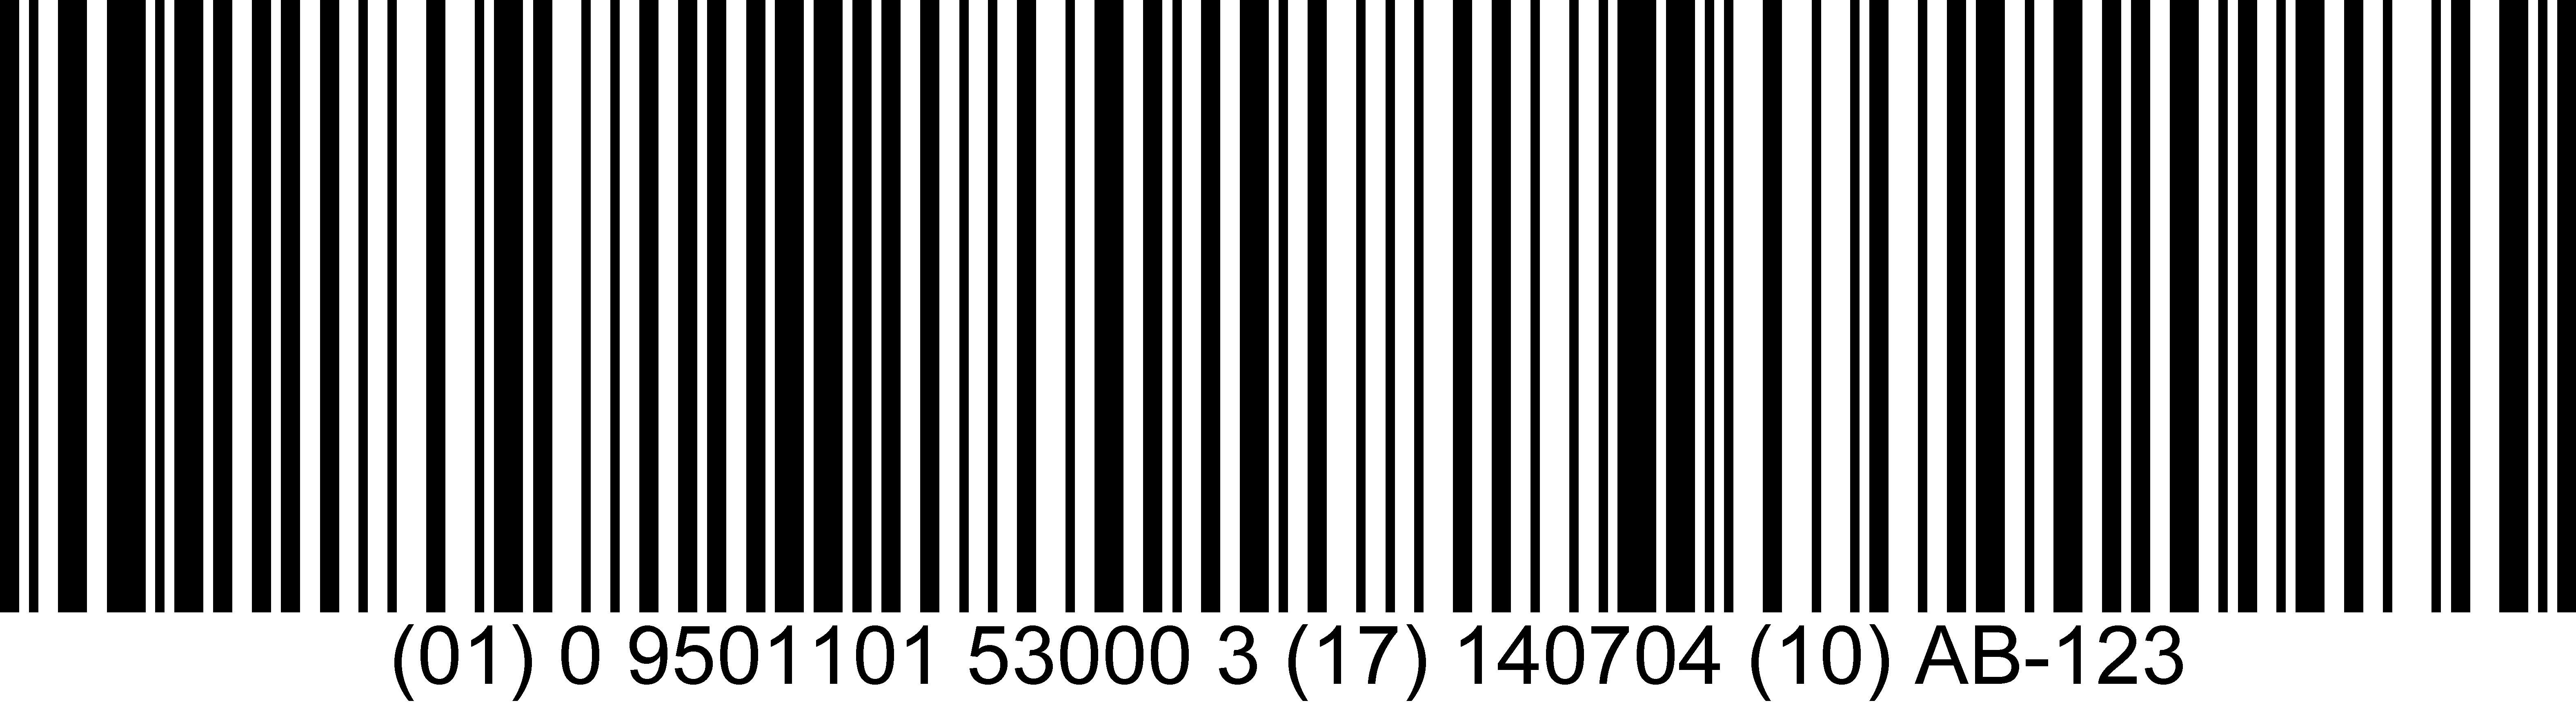 GS1 128